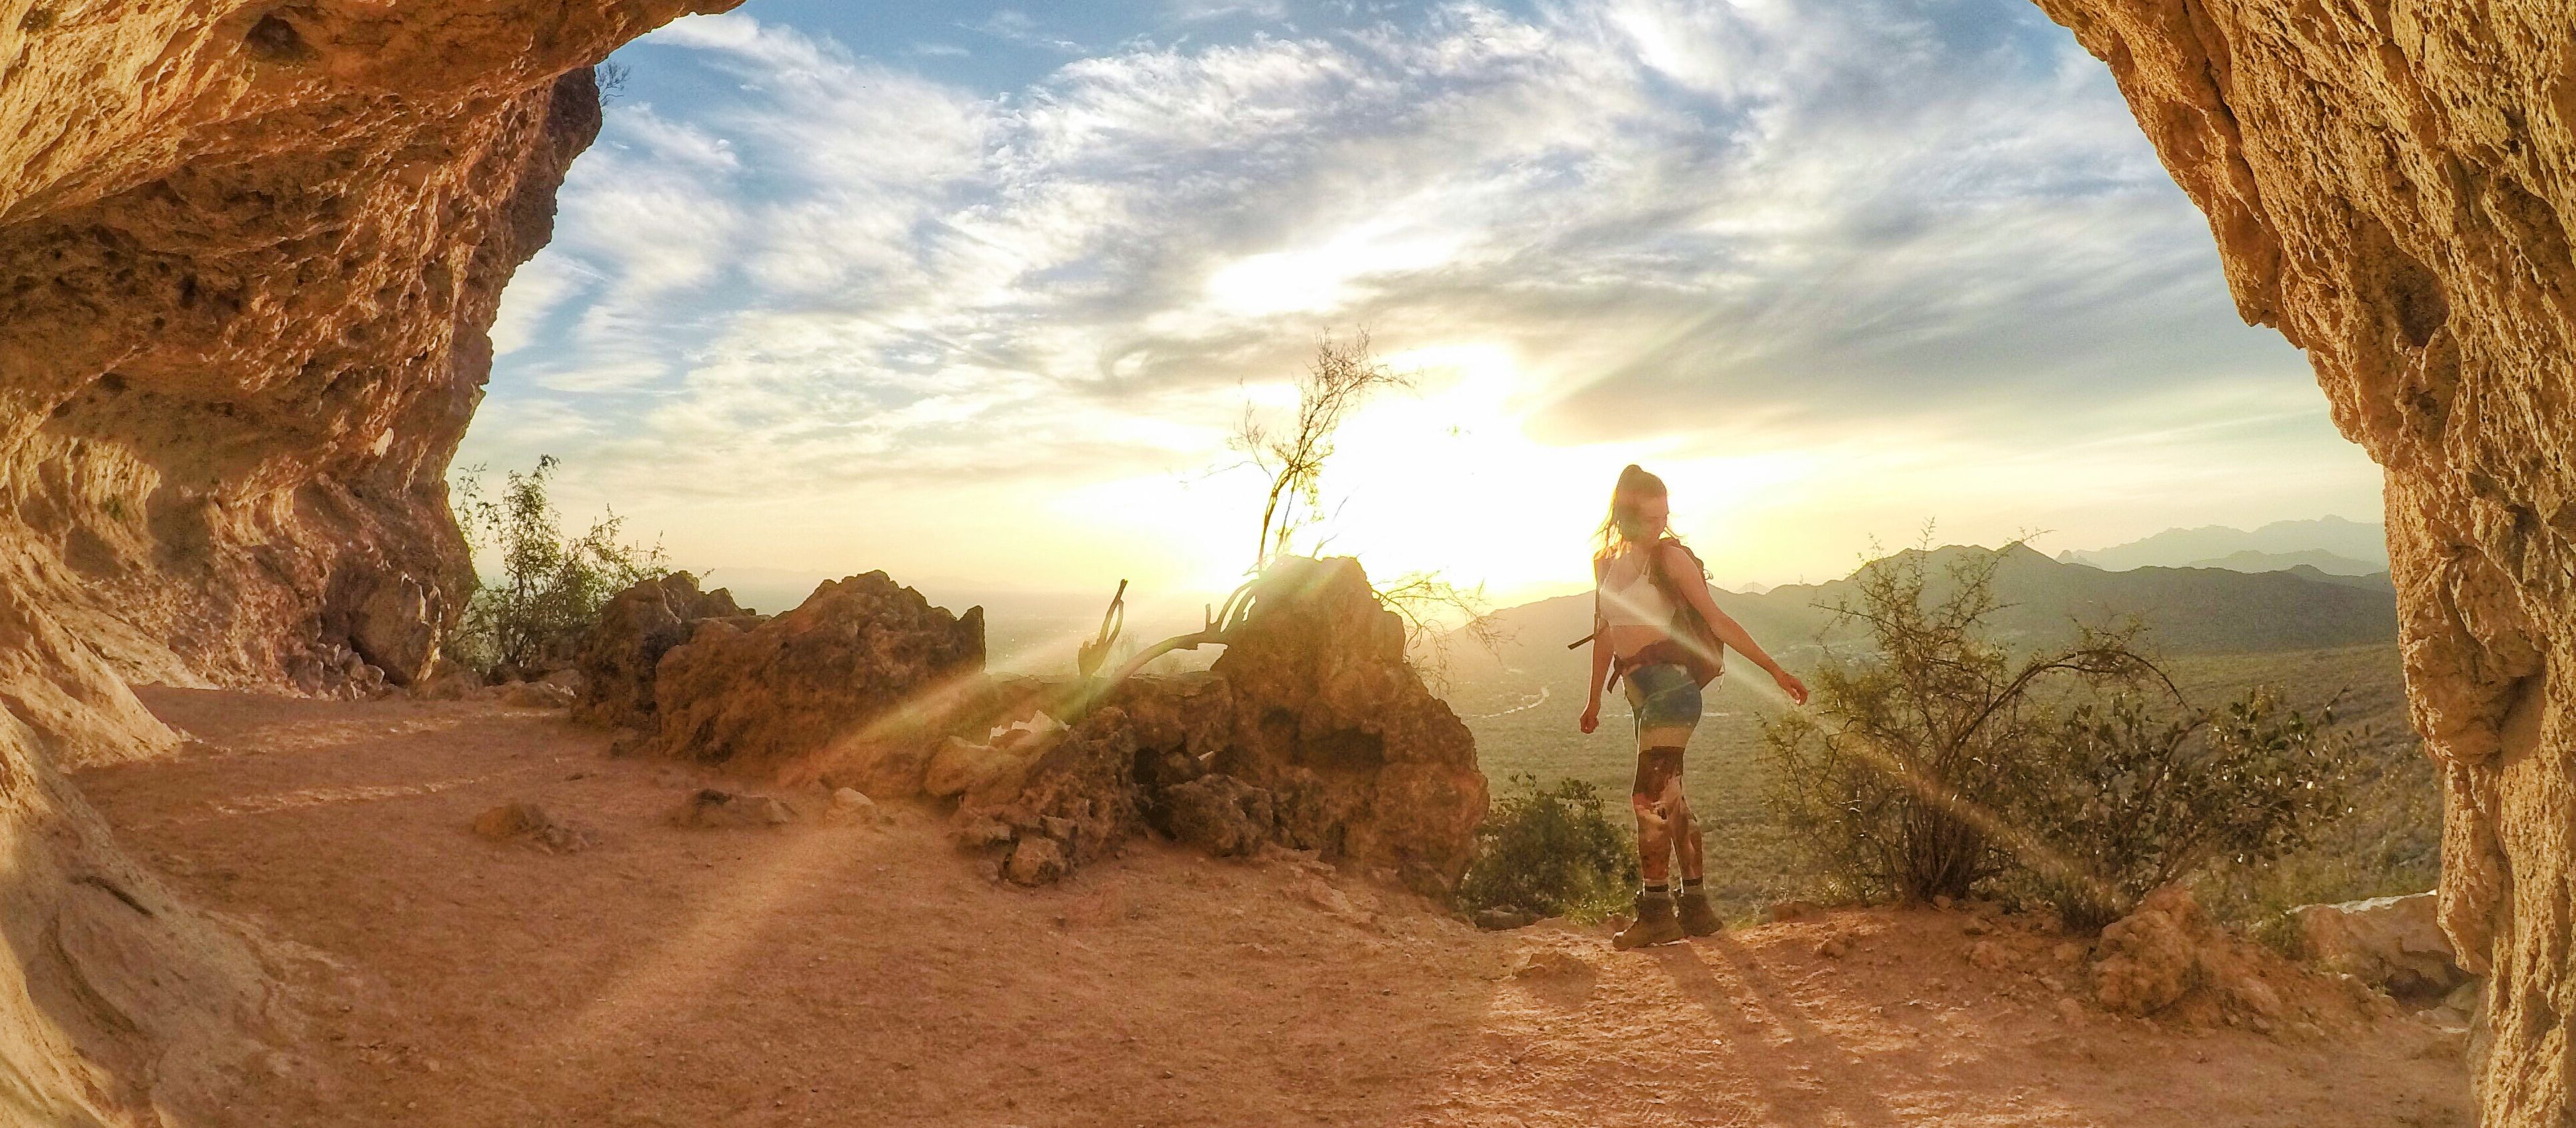 Entlang der Wind Cave Trail in Mesa, Arizona wandern